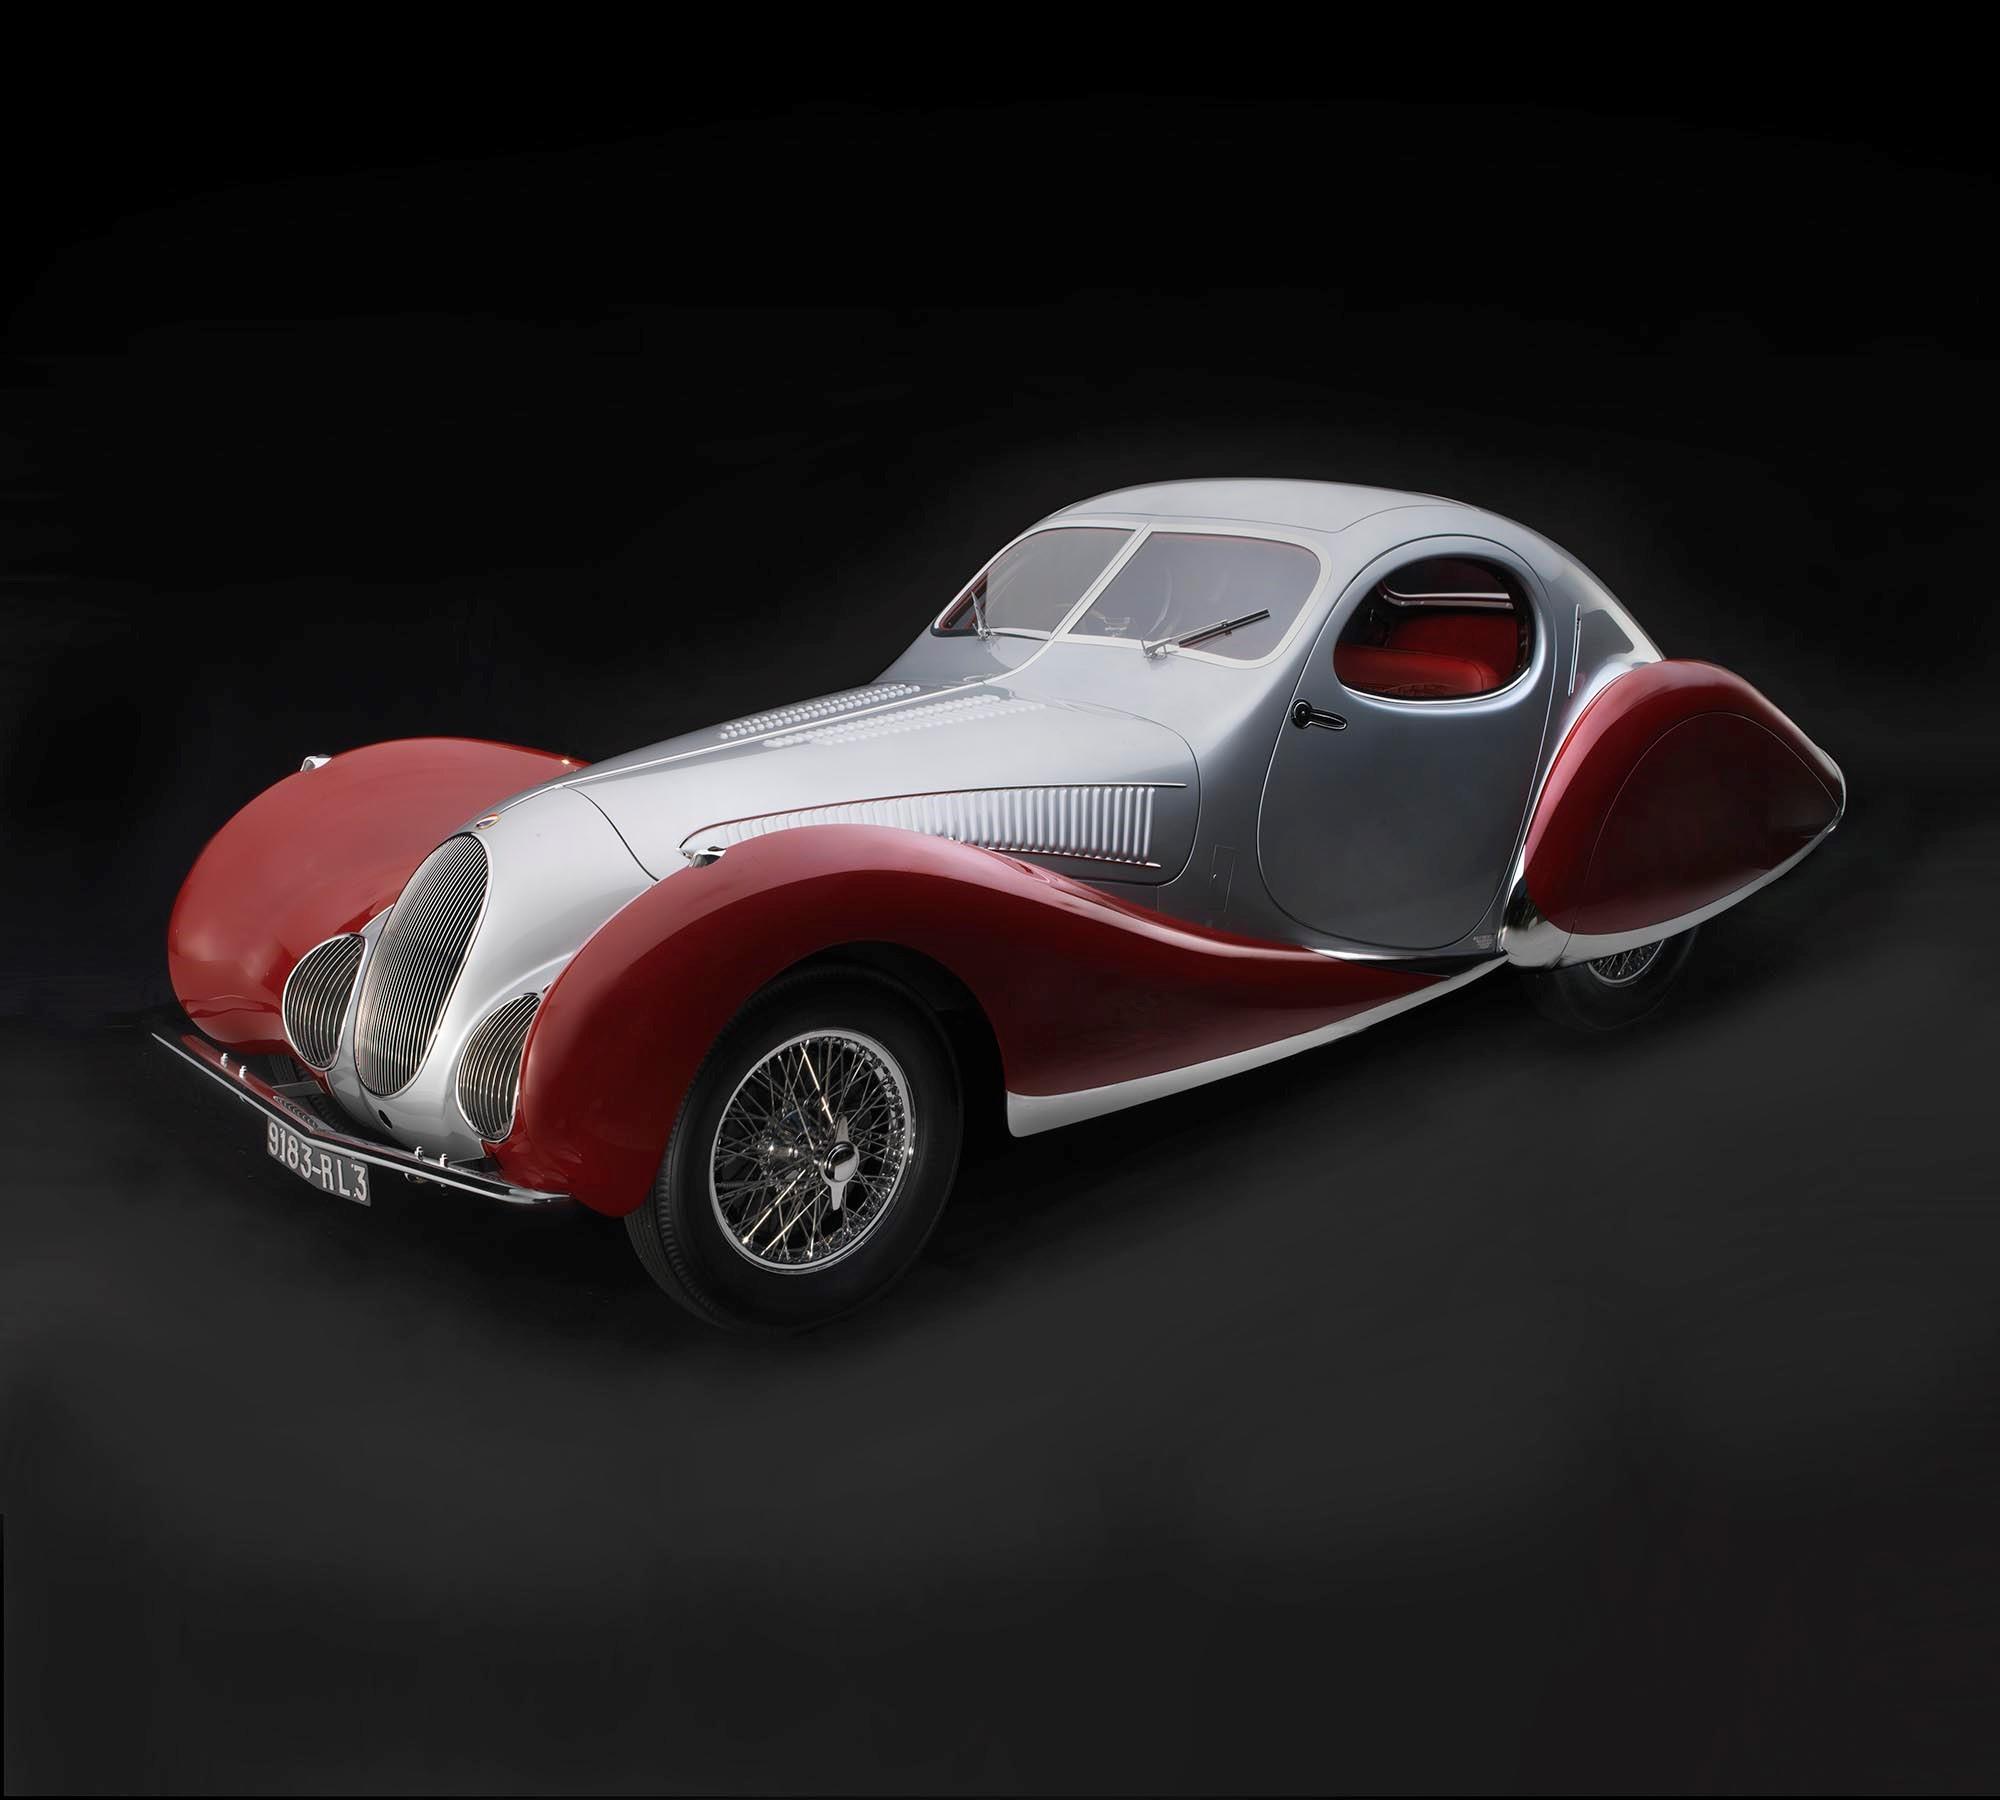 Talbot-Lago - T150C-SS Teardrop Coupe